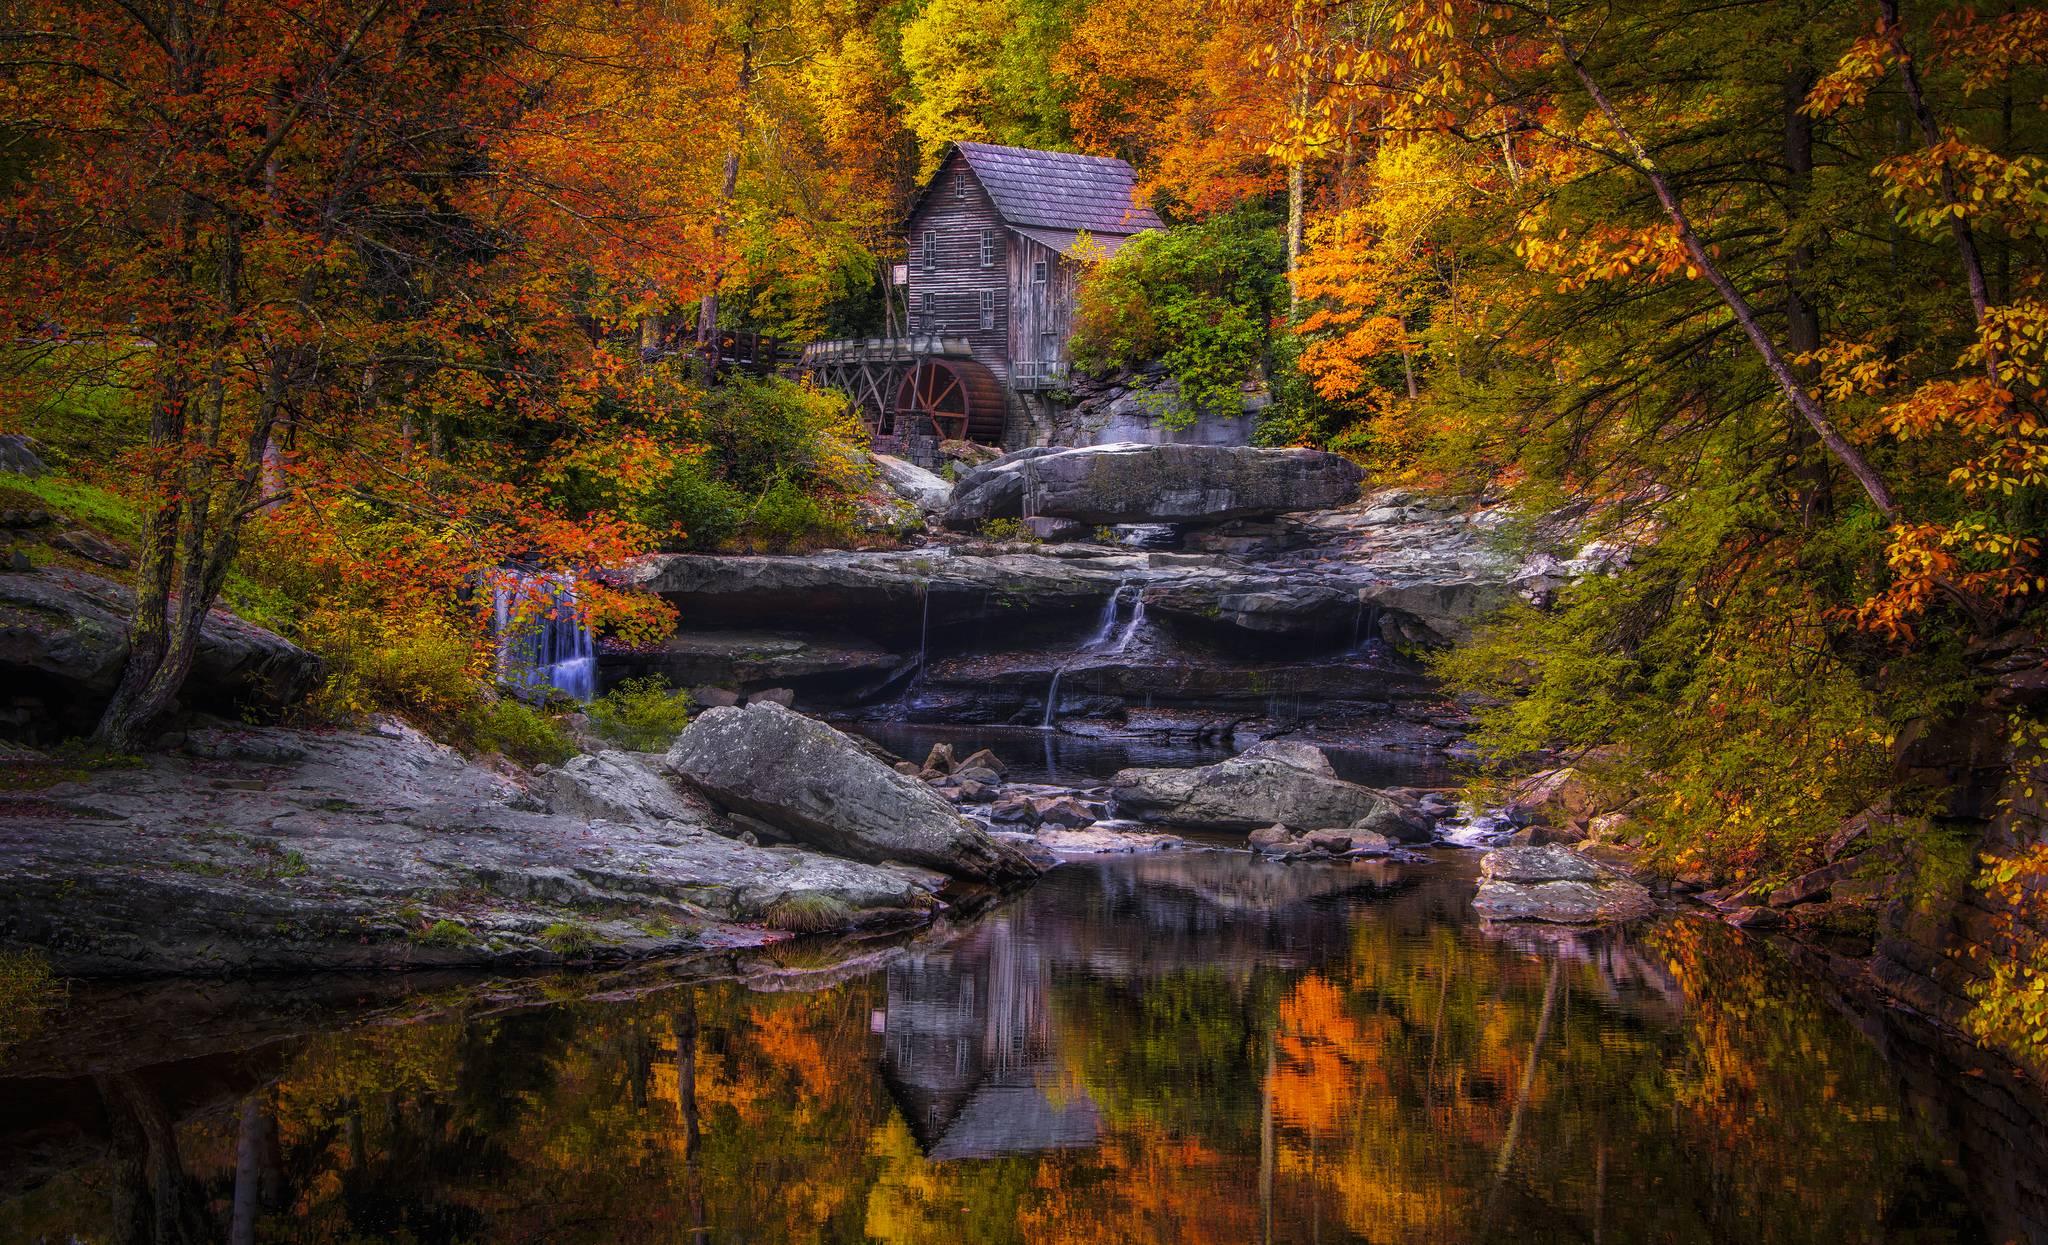 Glade Creek Grist Mill, West Virginia, водяная мельница